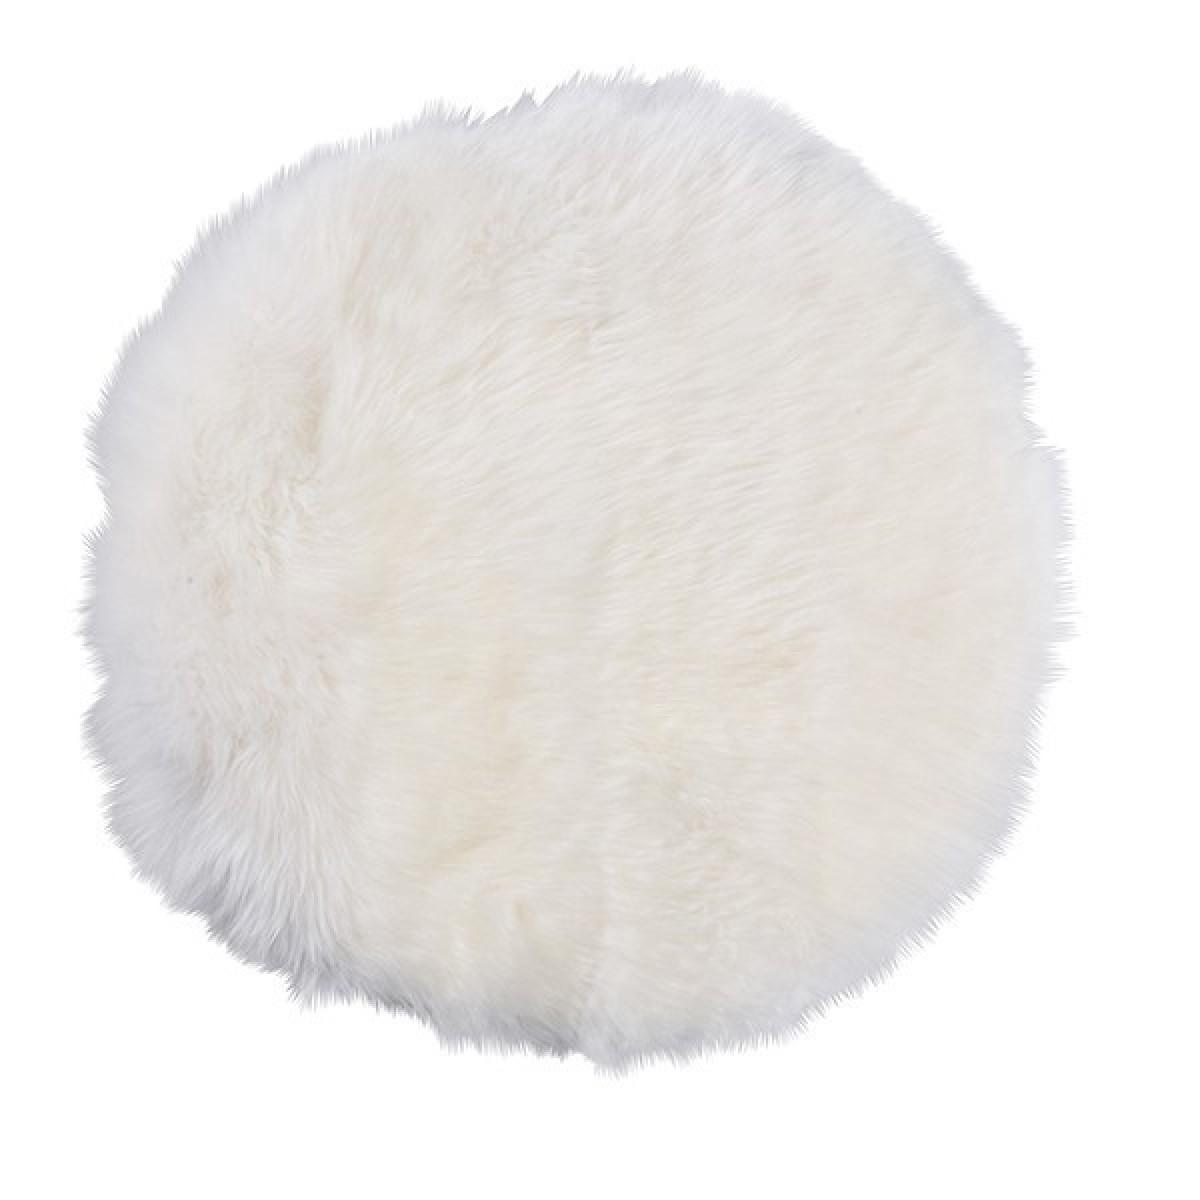 DACORE Sædehynde lammeskind rund hvid 37 cm.